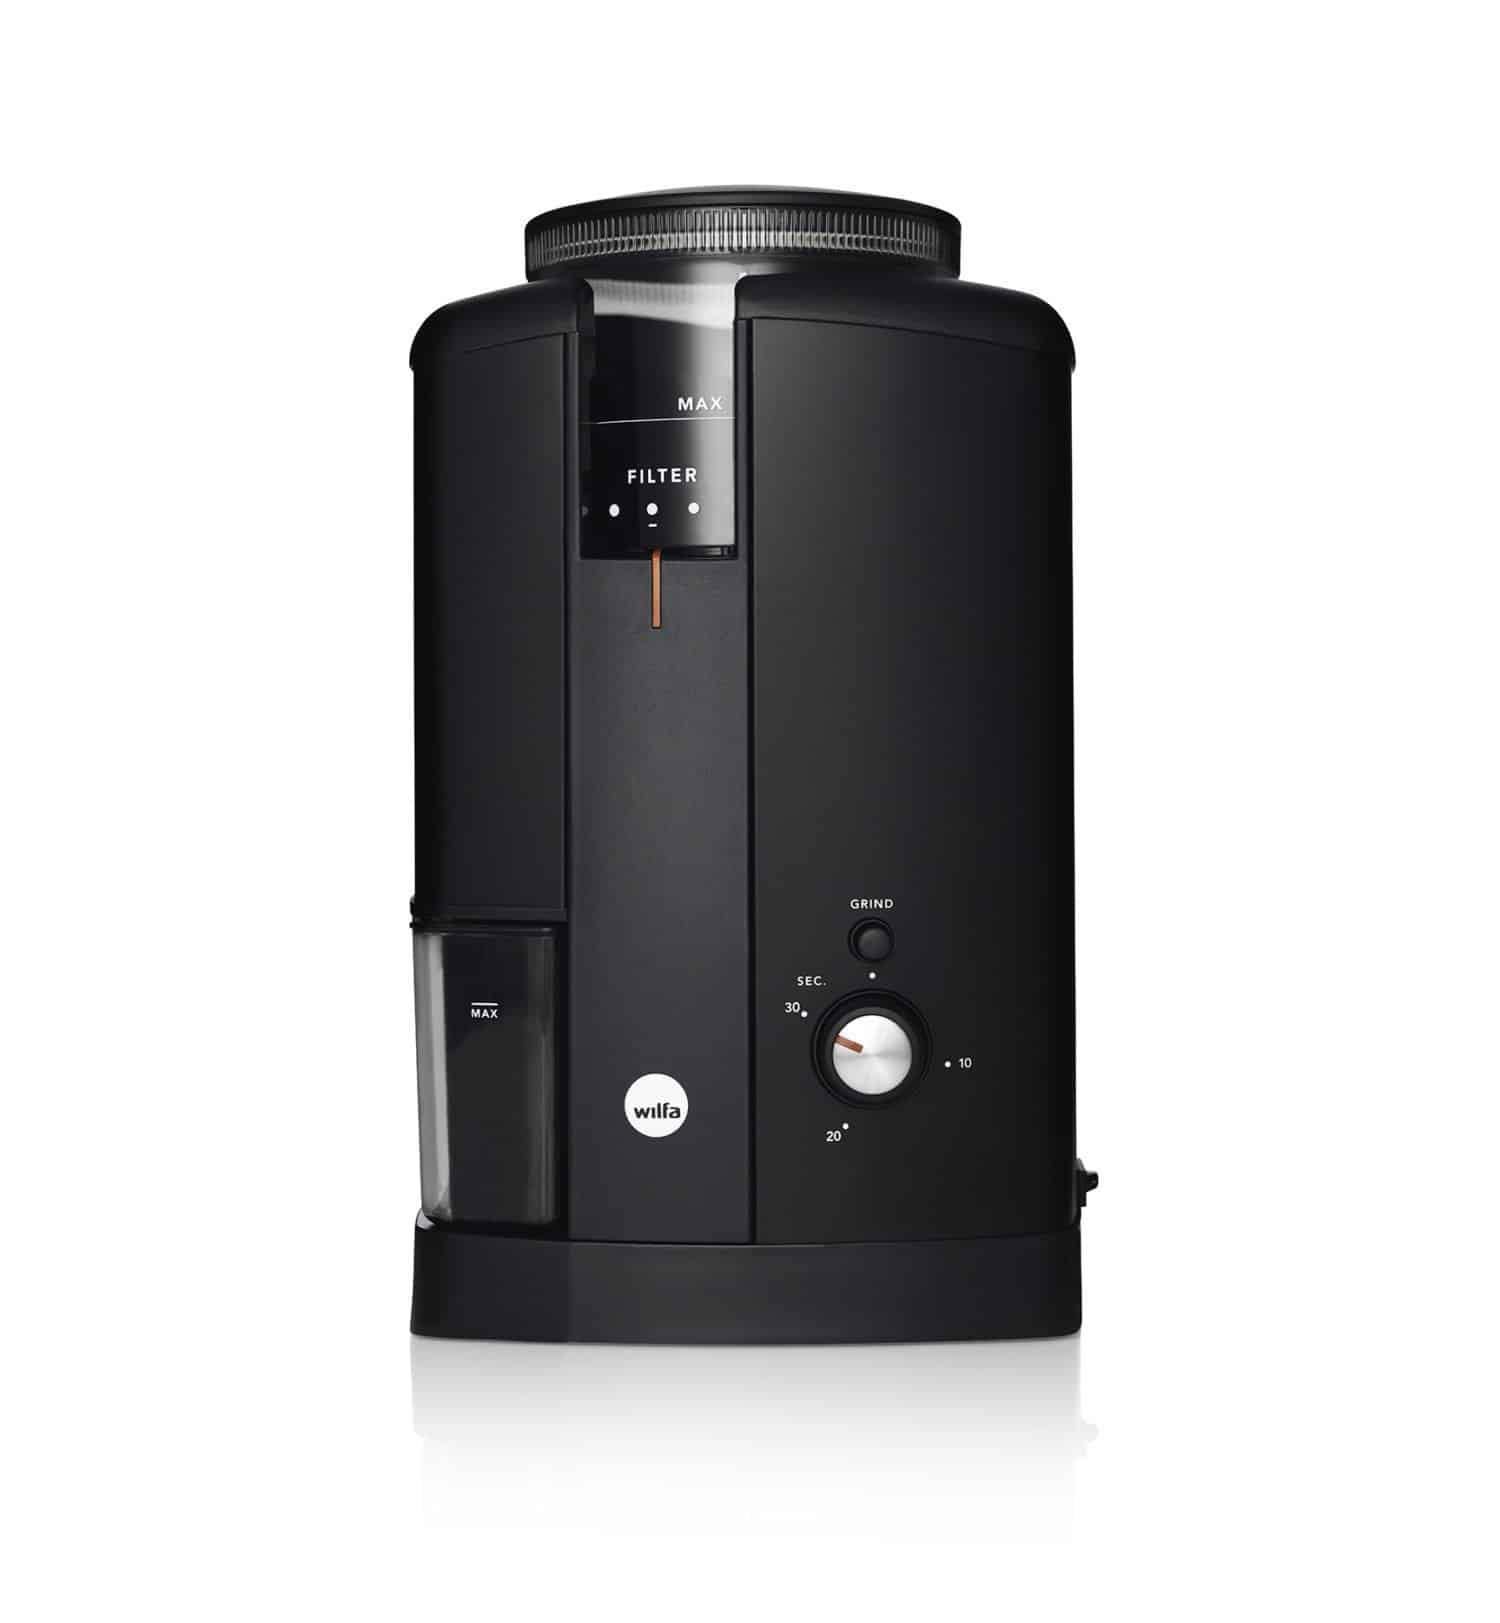 Wilfa svart elektrisk kaffekvarn från www.kaffebönor.se